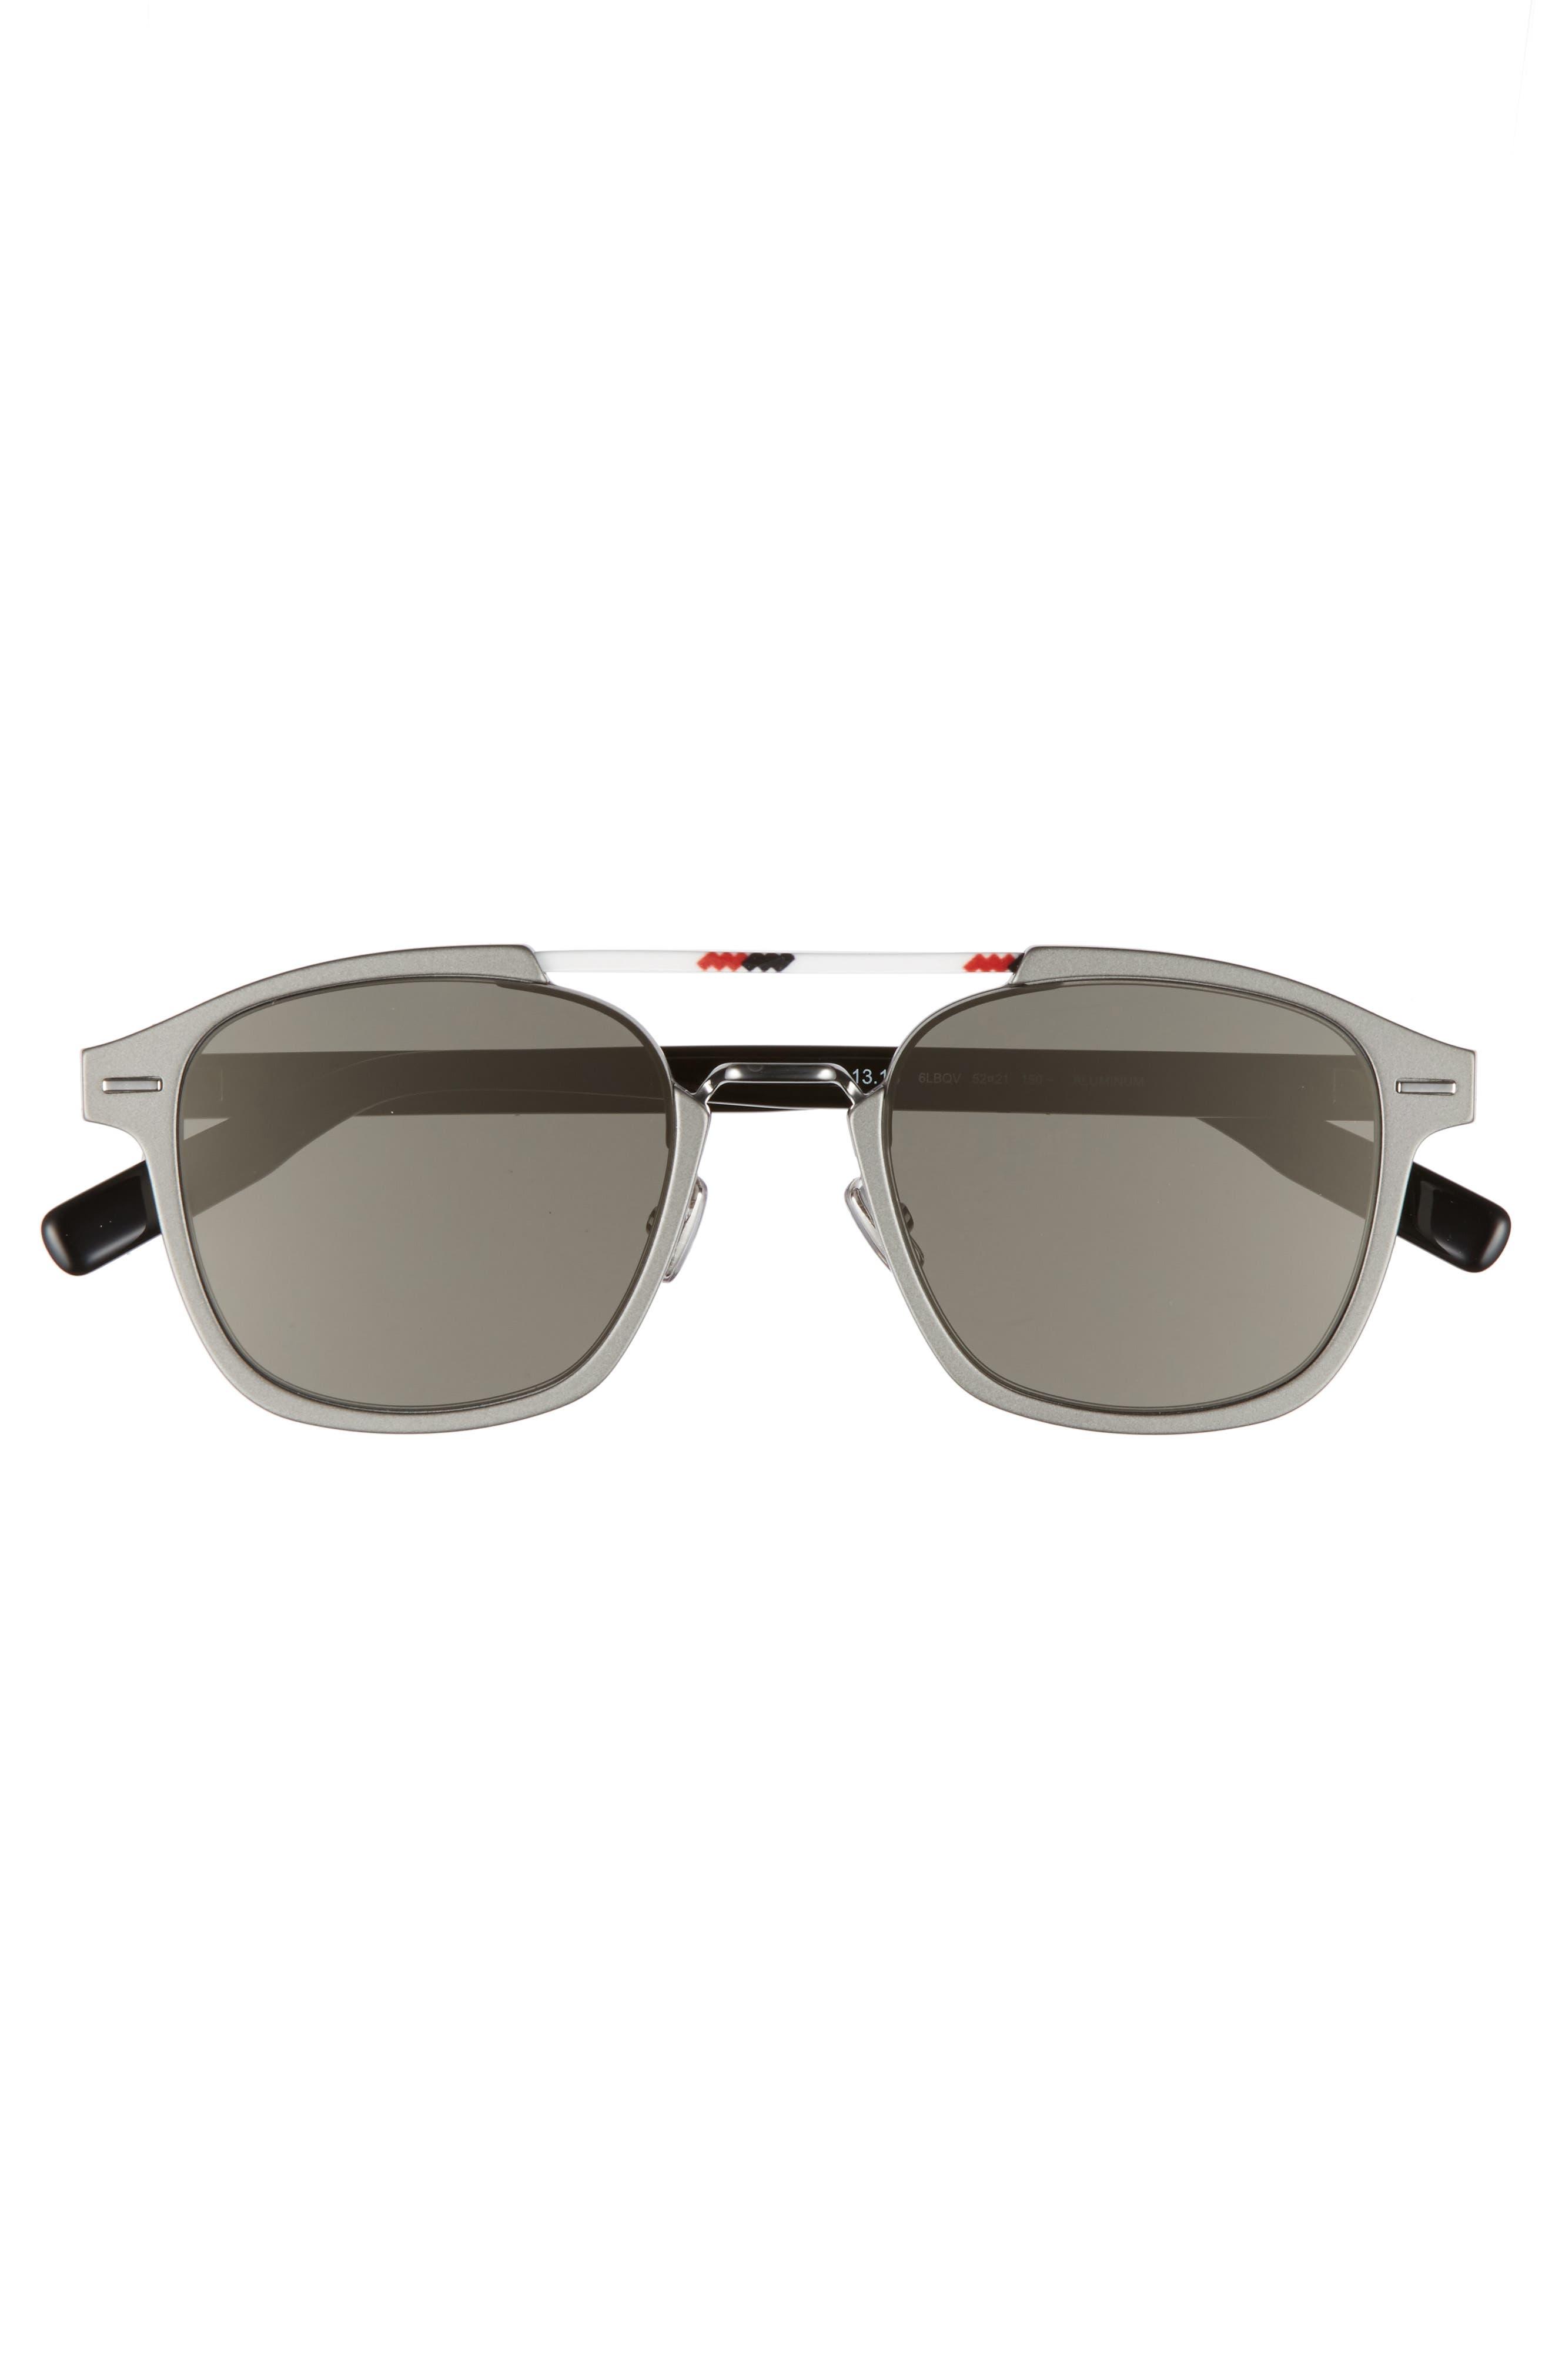 AL13.13 52mm Sunglasses,                             Alternate thumbnail 2, color,                             RUTHENIUM/ IVORY